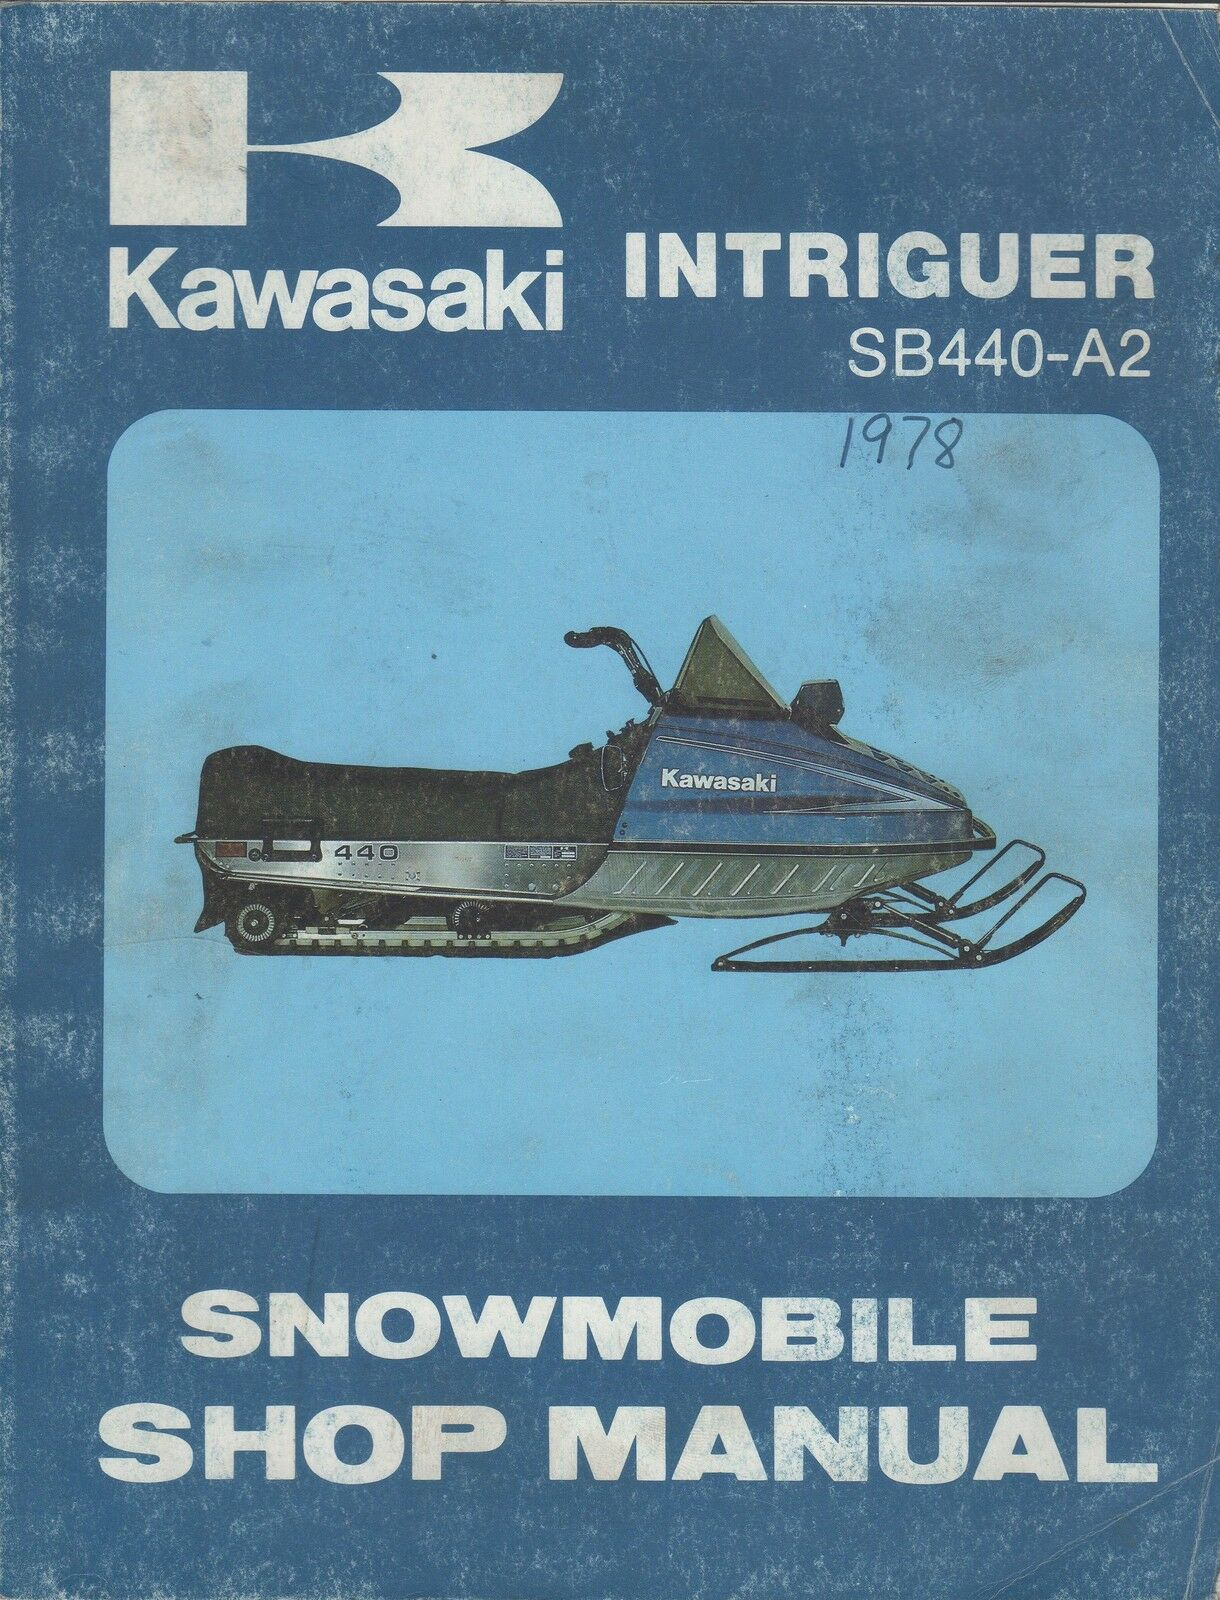 1978 KAWASAKI SNOWMOBILE INTRIGUER P N 99963-3502 SERVICE SHOP MANUAL (502)